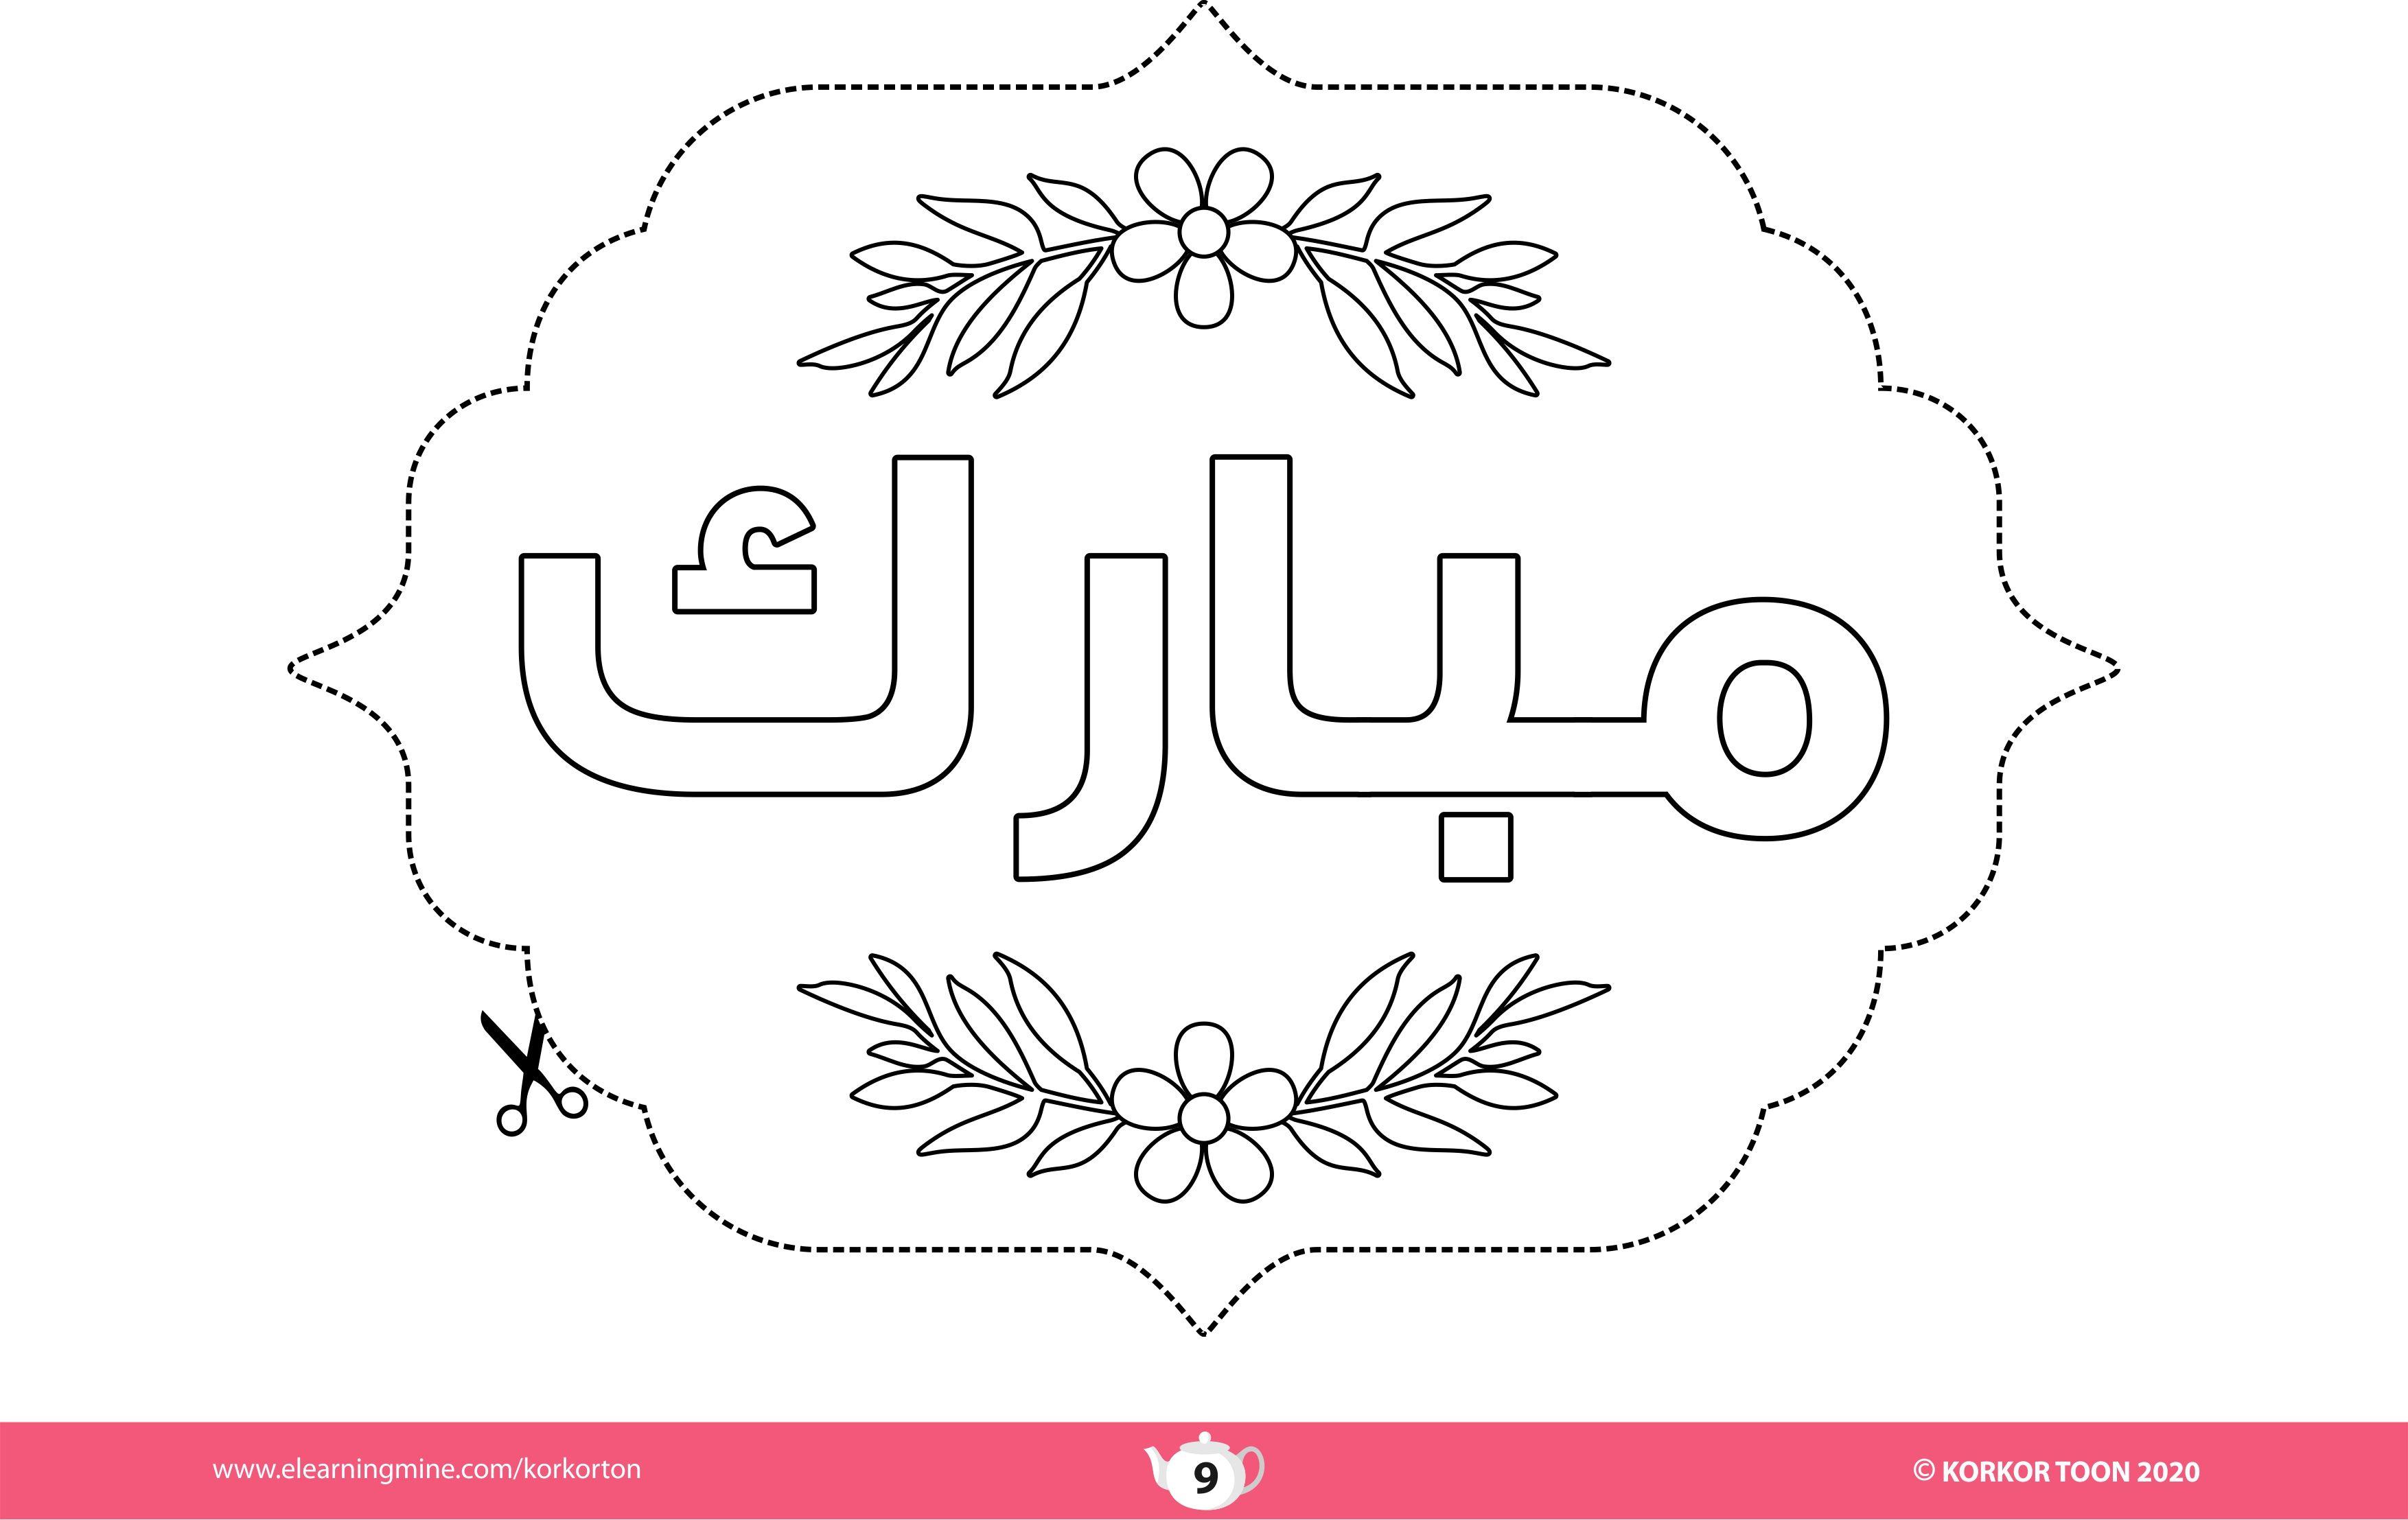 Printable Eid Decoration زينة العيد للطباعة Eid Decoration Decor Home Decor Decals